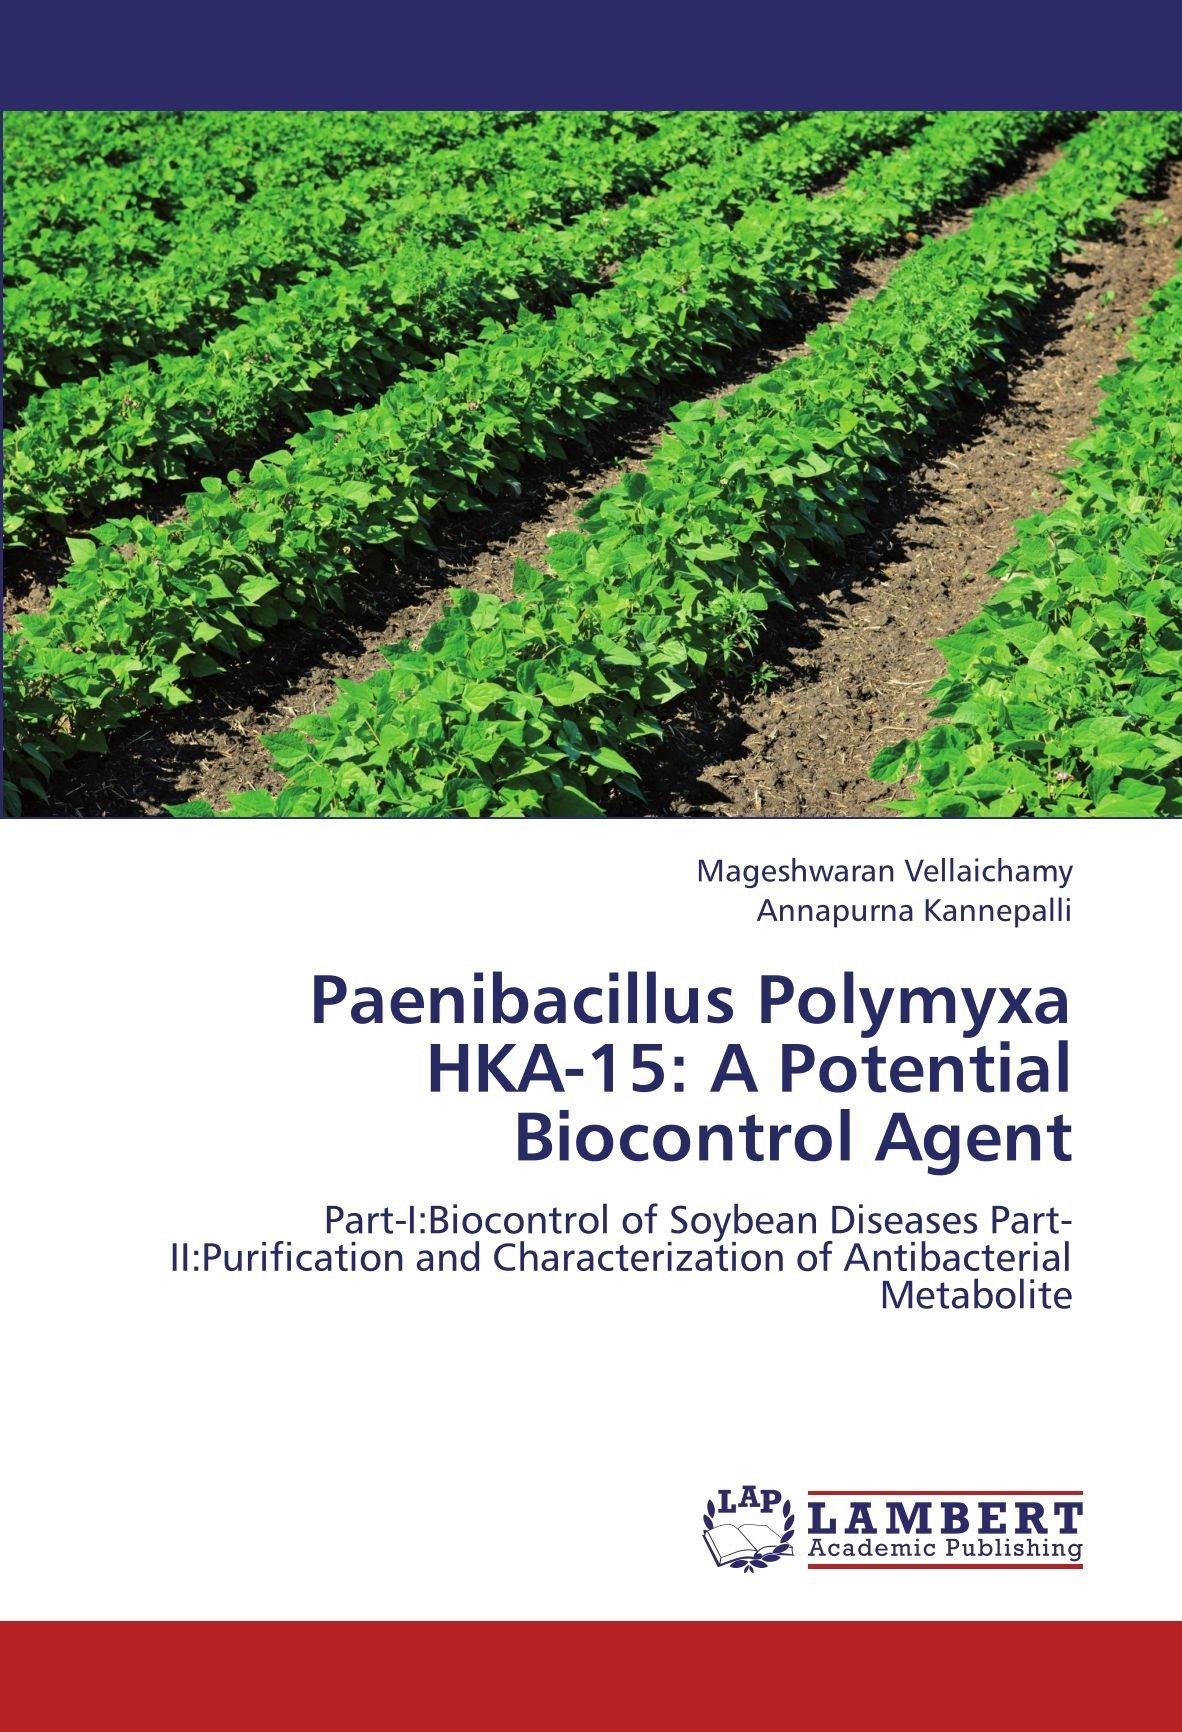 Paenibacillus Polymyxa HKA-15: A Potential Biocontrol Agent: Part-I:Biocontrol of Soybean Diseases Part-II:Purification and Characterization of Antibacterial Metabolite pdf epub